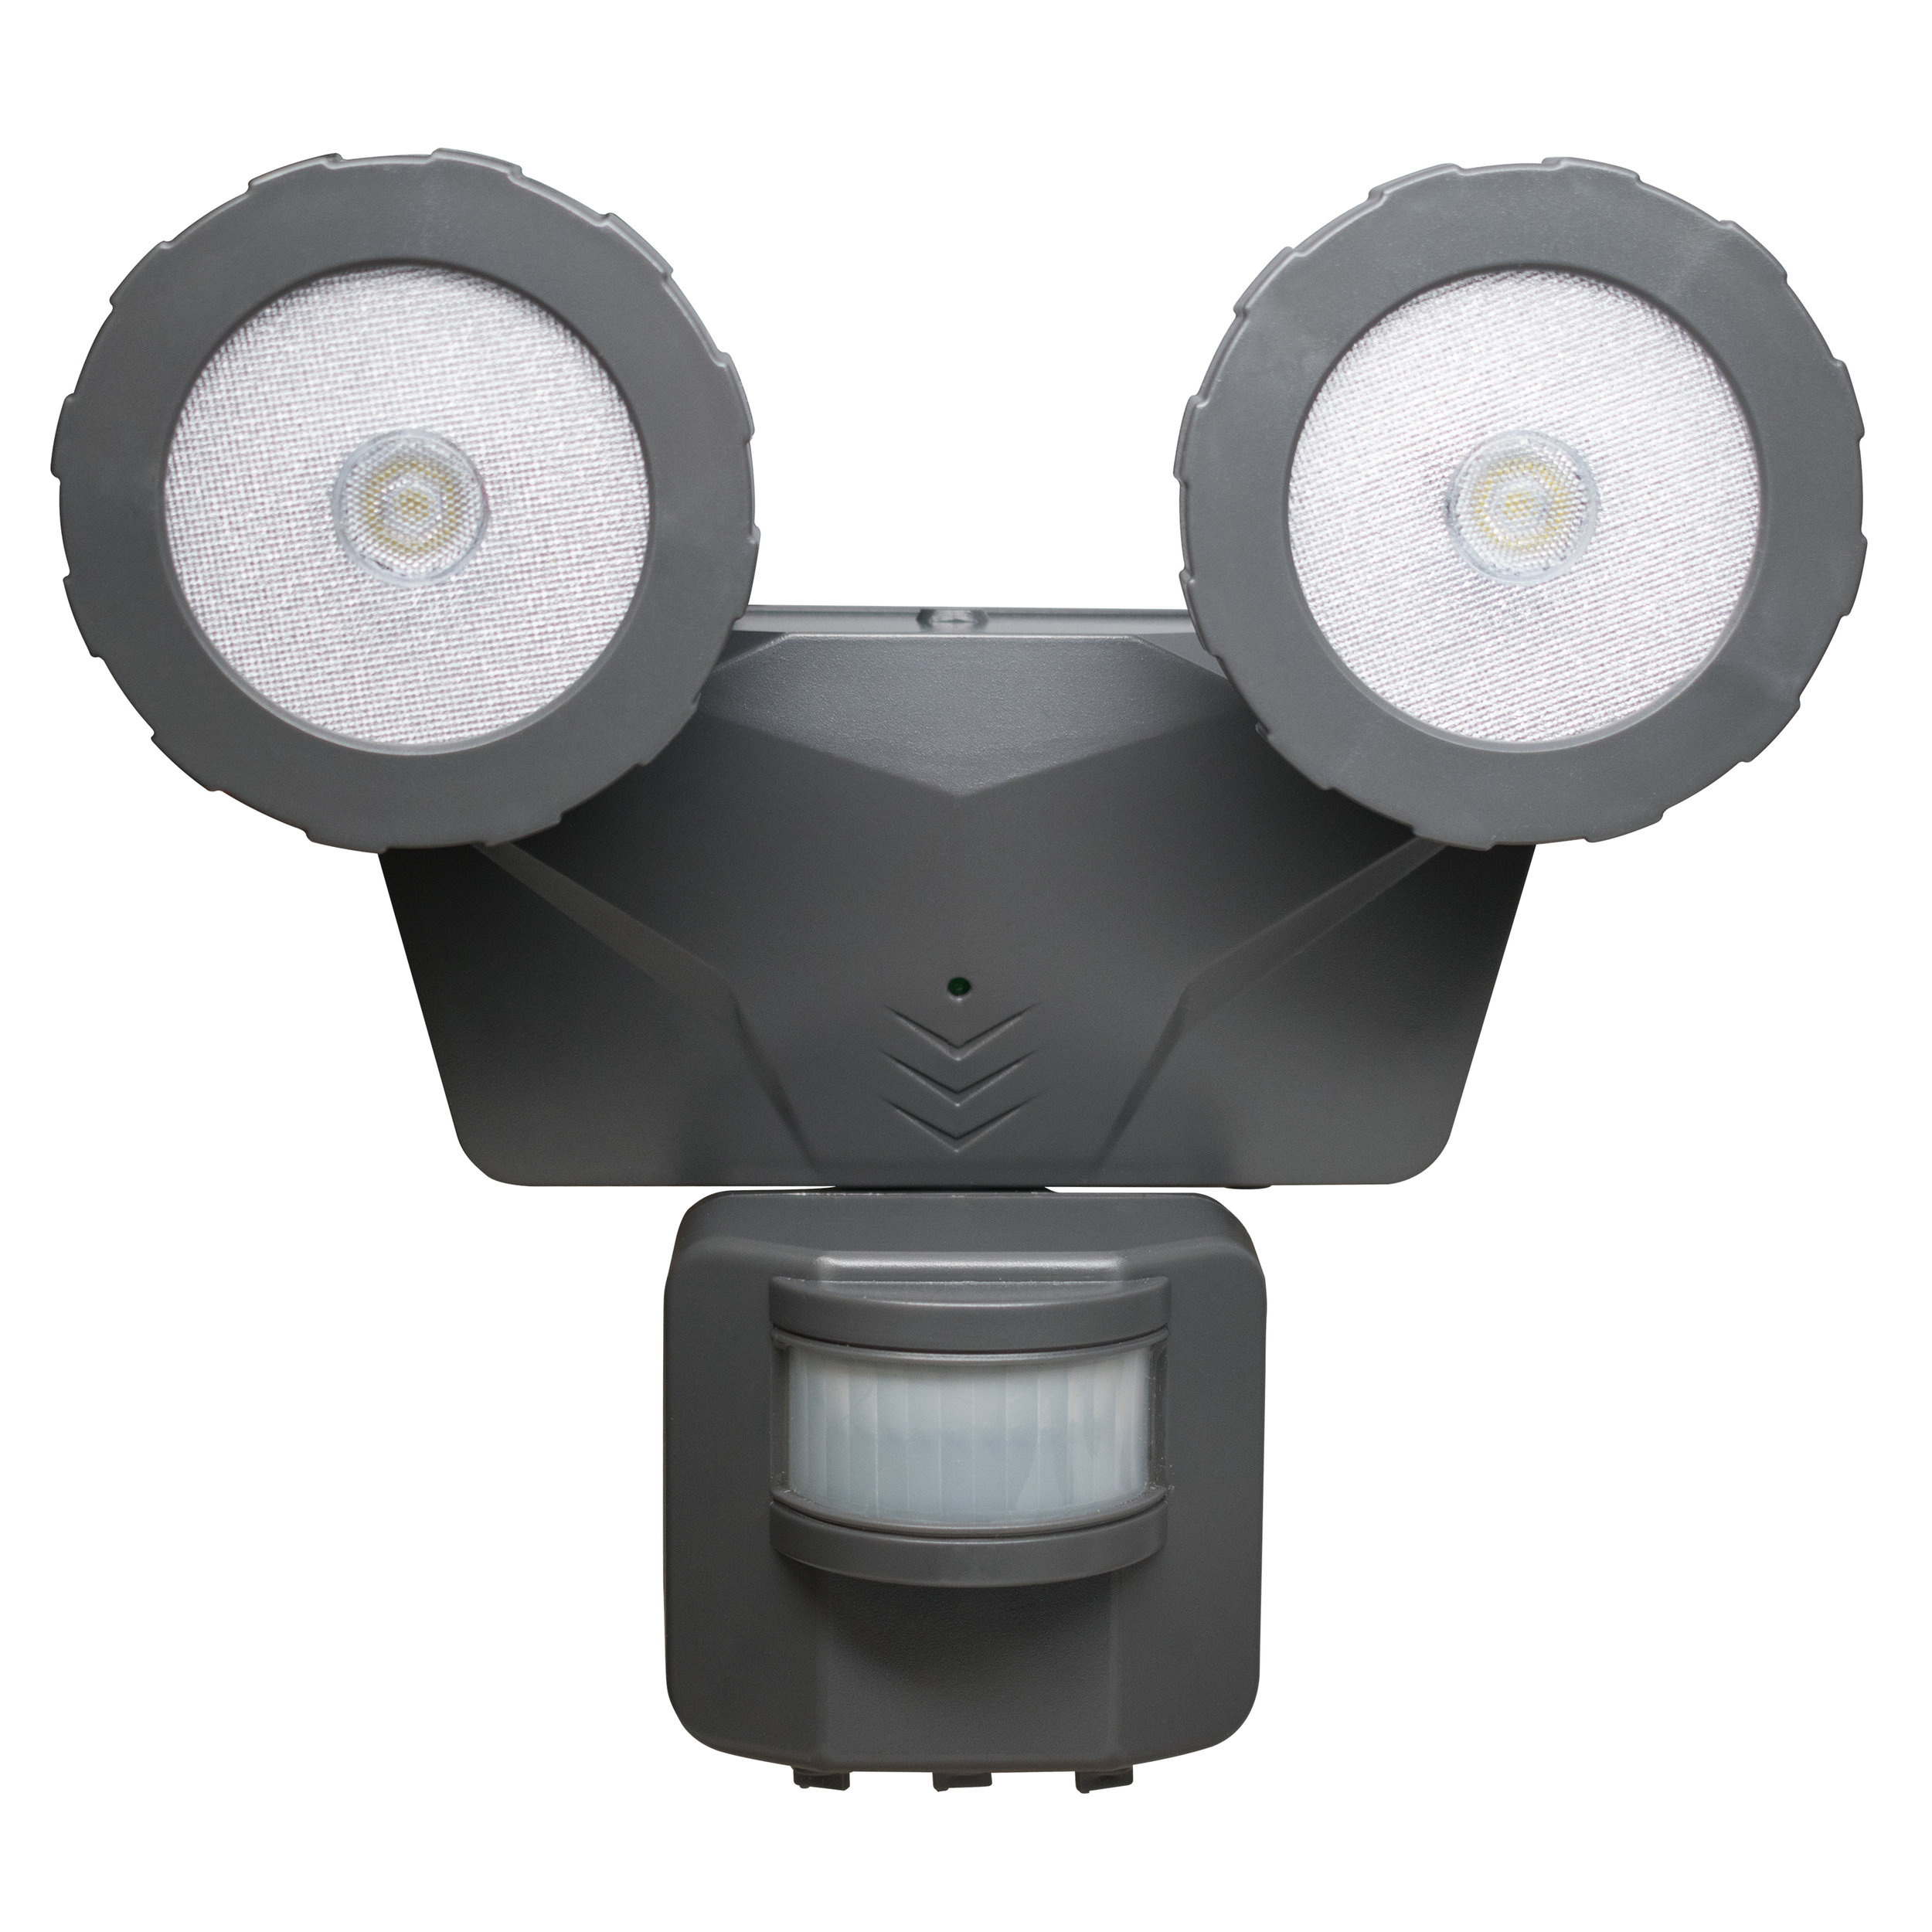 NL-DSG2 Solar Security Light, Front